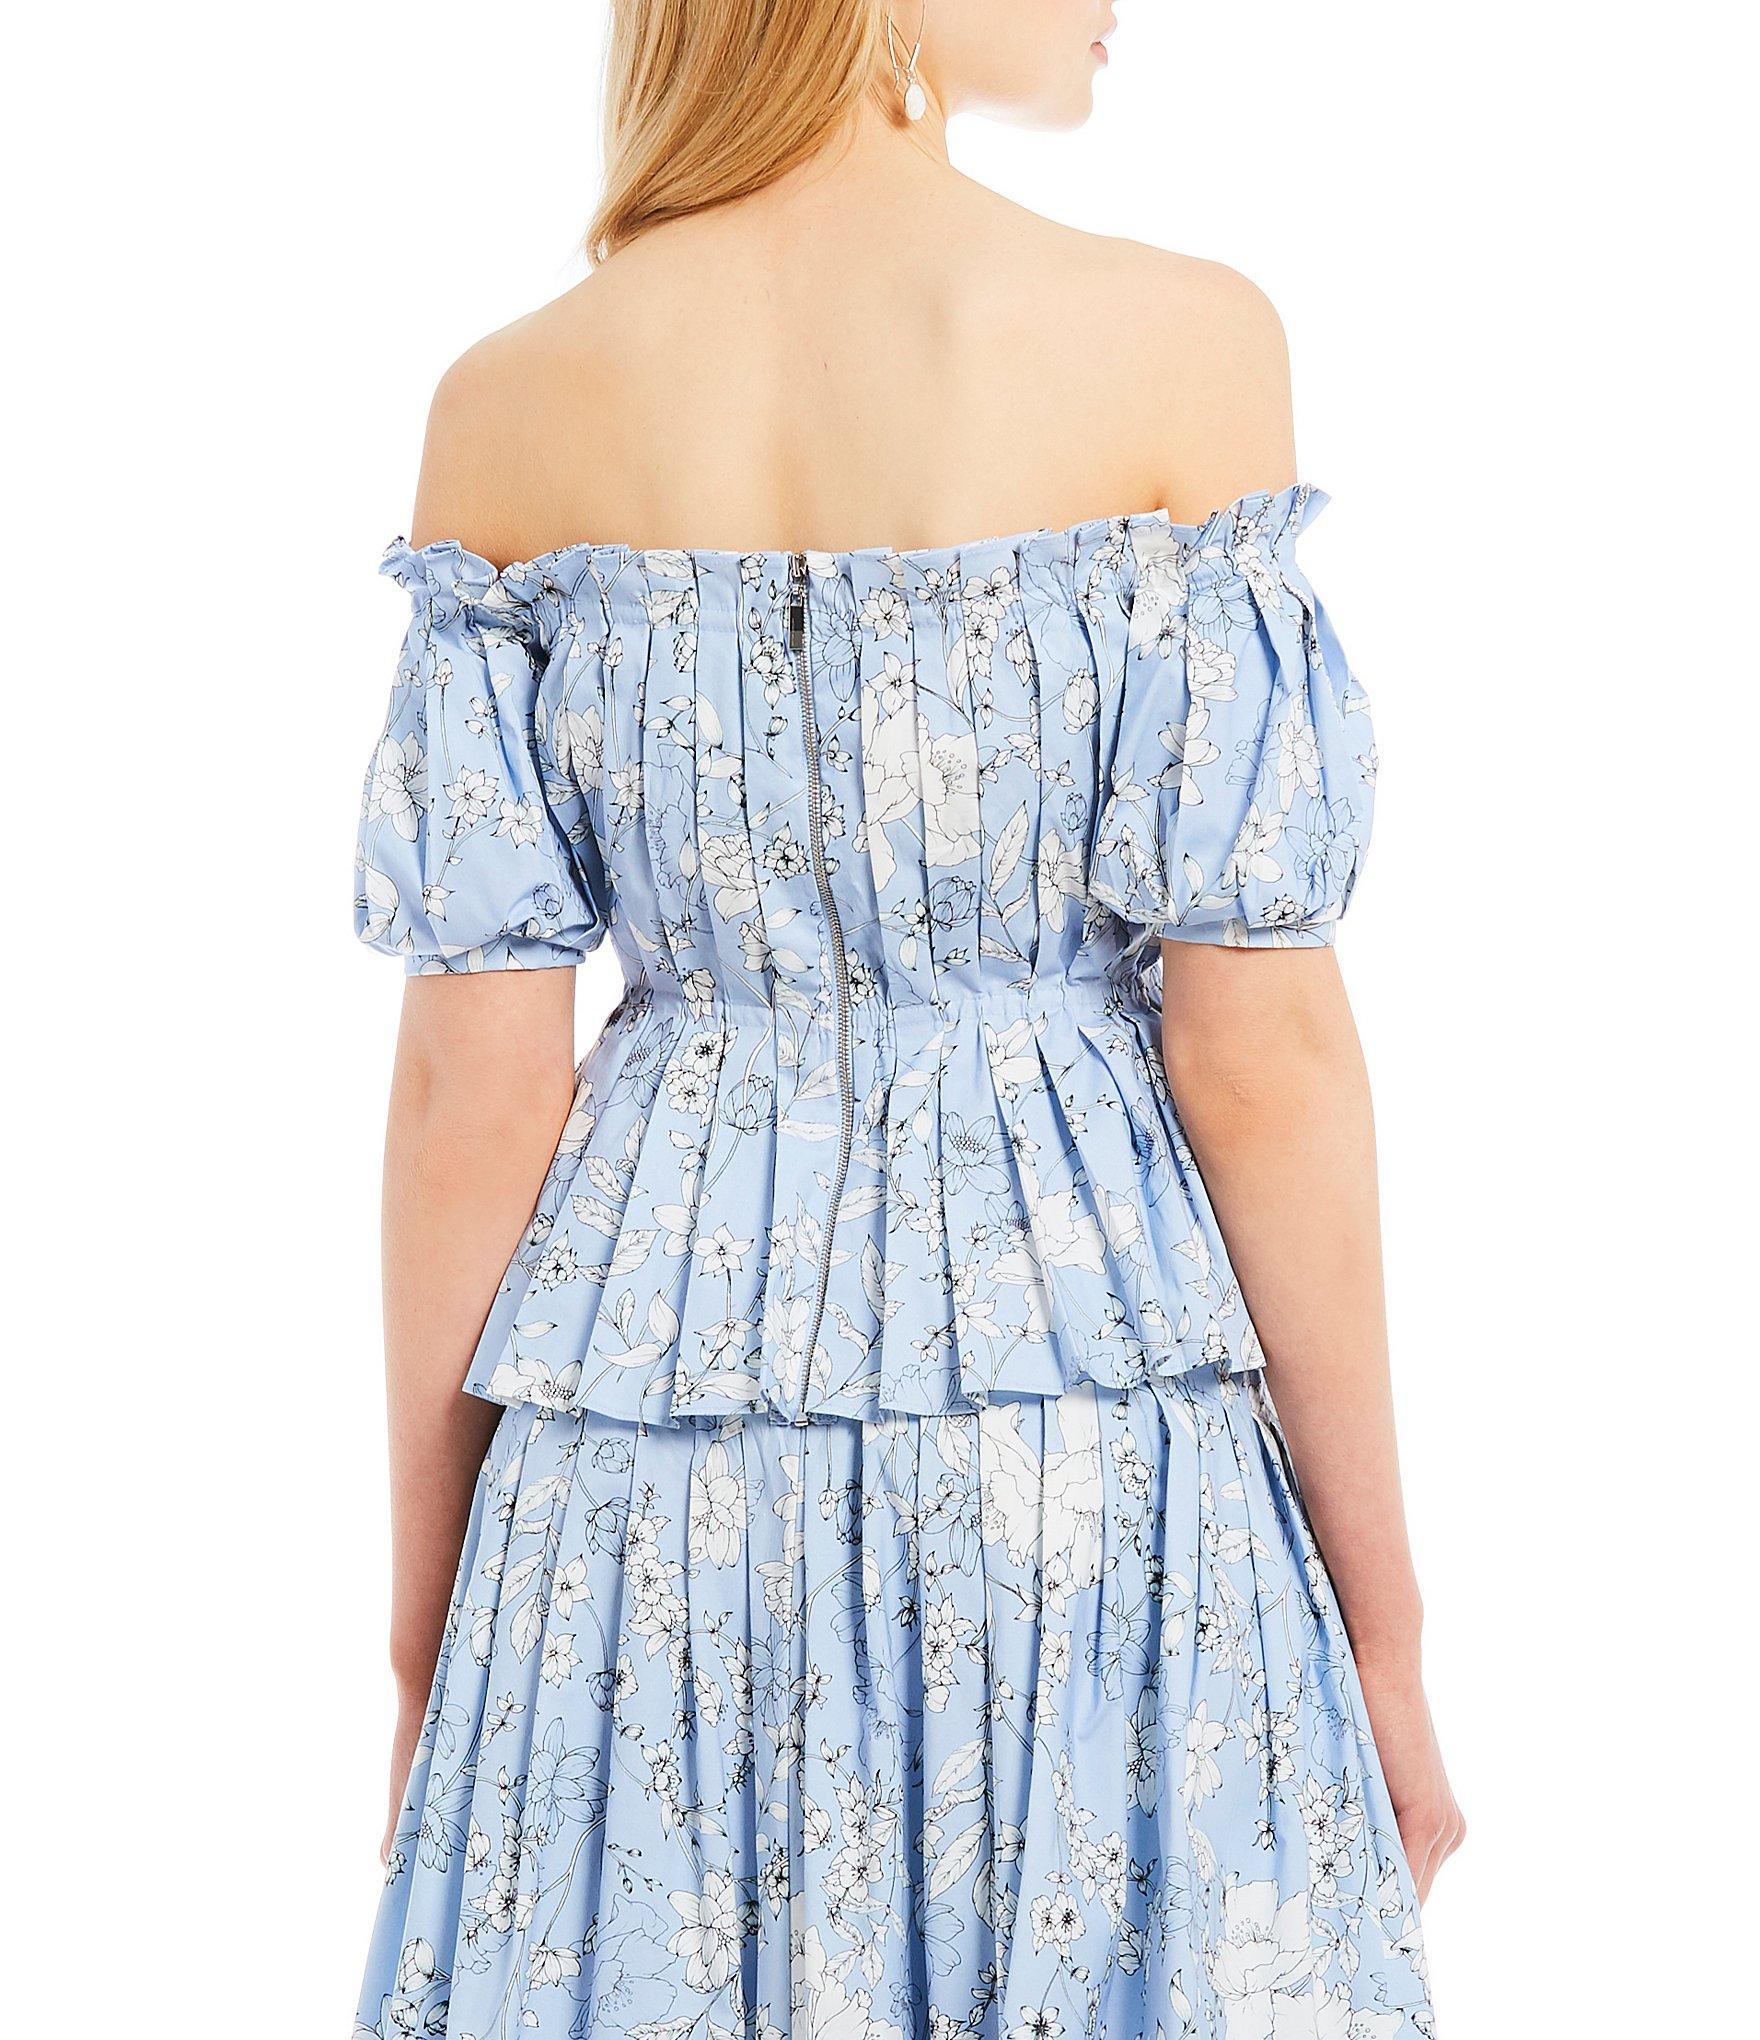 2a3b87e09759f Antonio Melani - Blue Kyla Off-the-shoulder Floral Print Peplum Blouse -  Lyst. View fullscreen